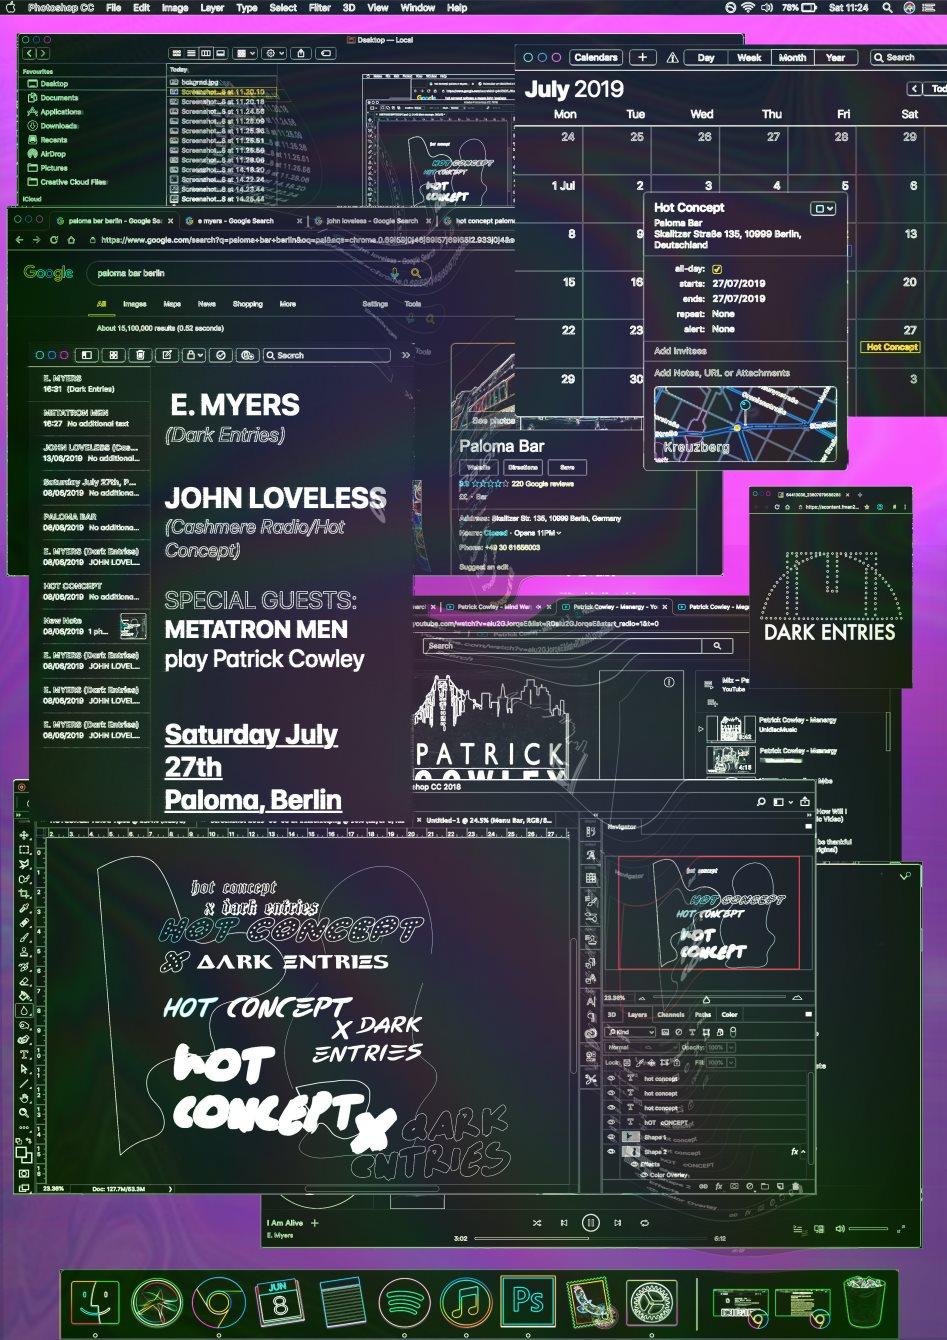 Hot Concept X Dark Entries - Flyer front